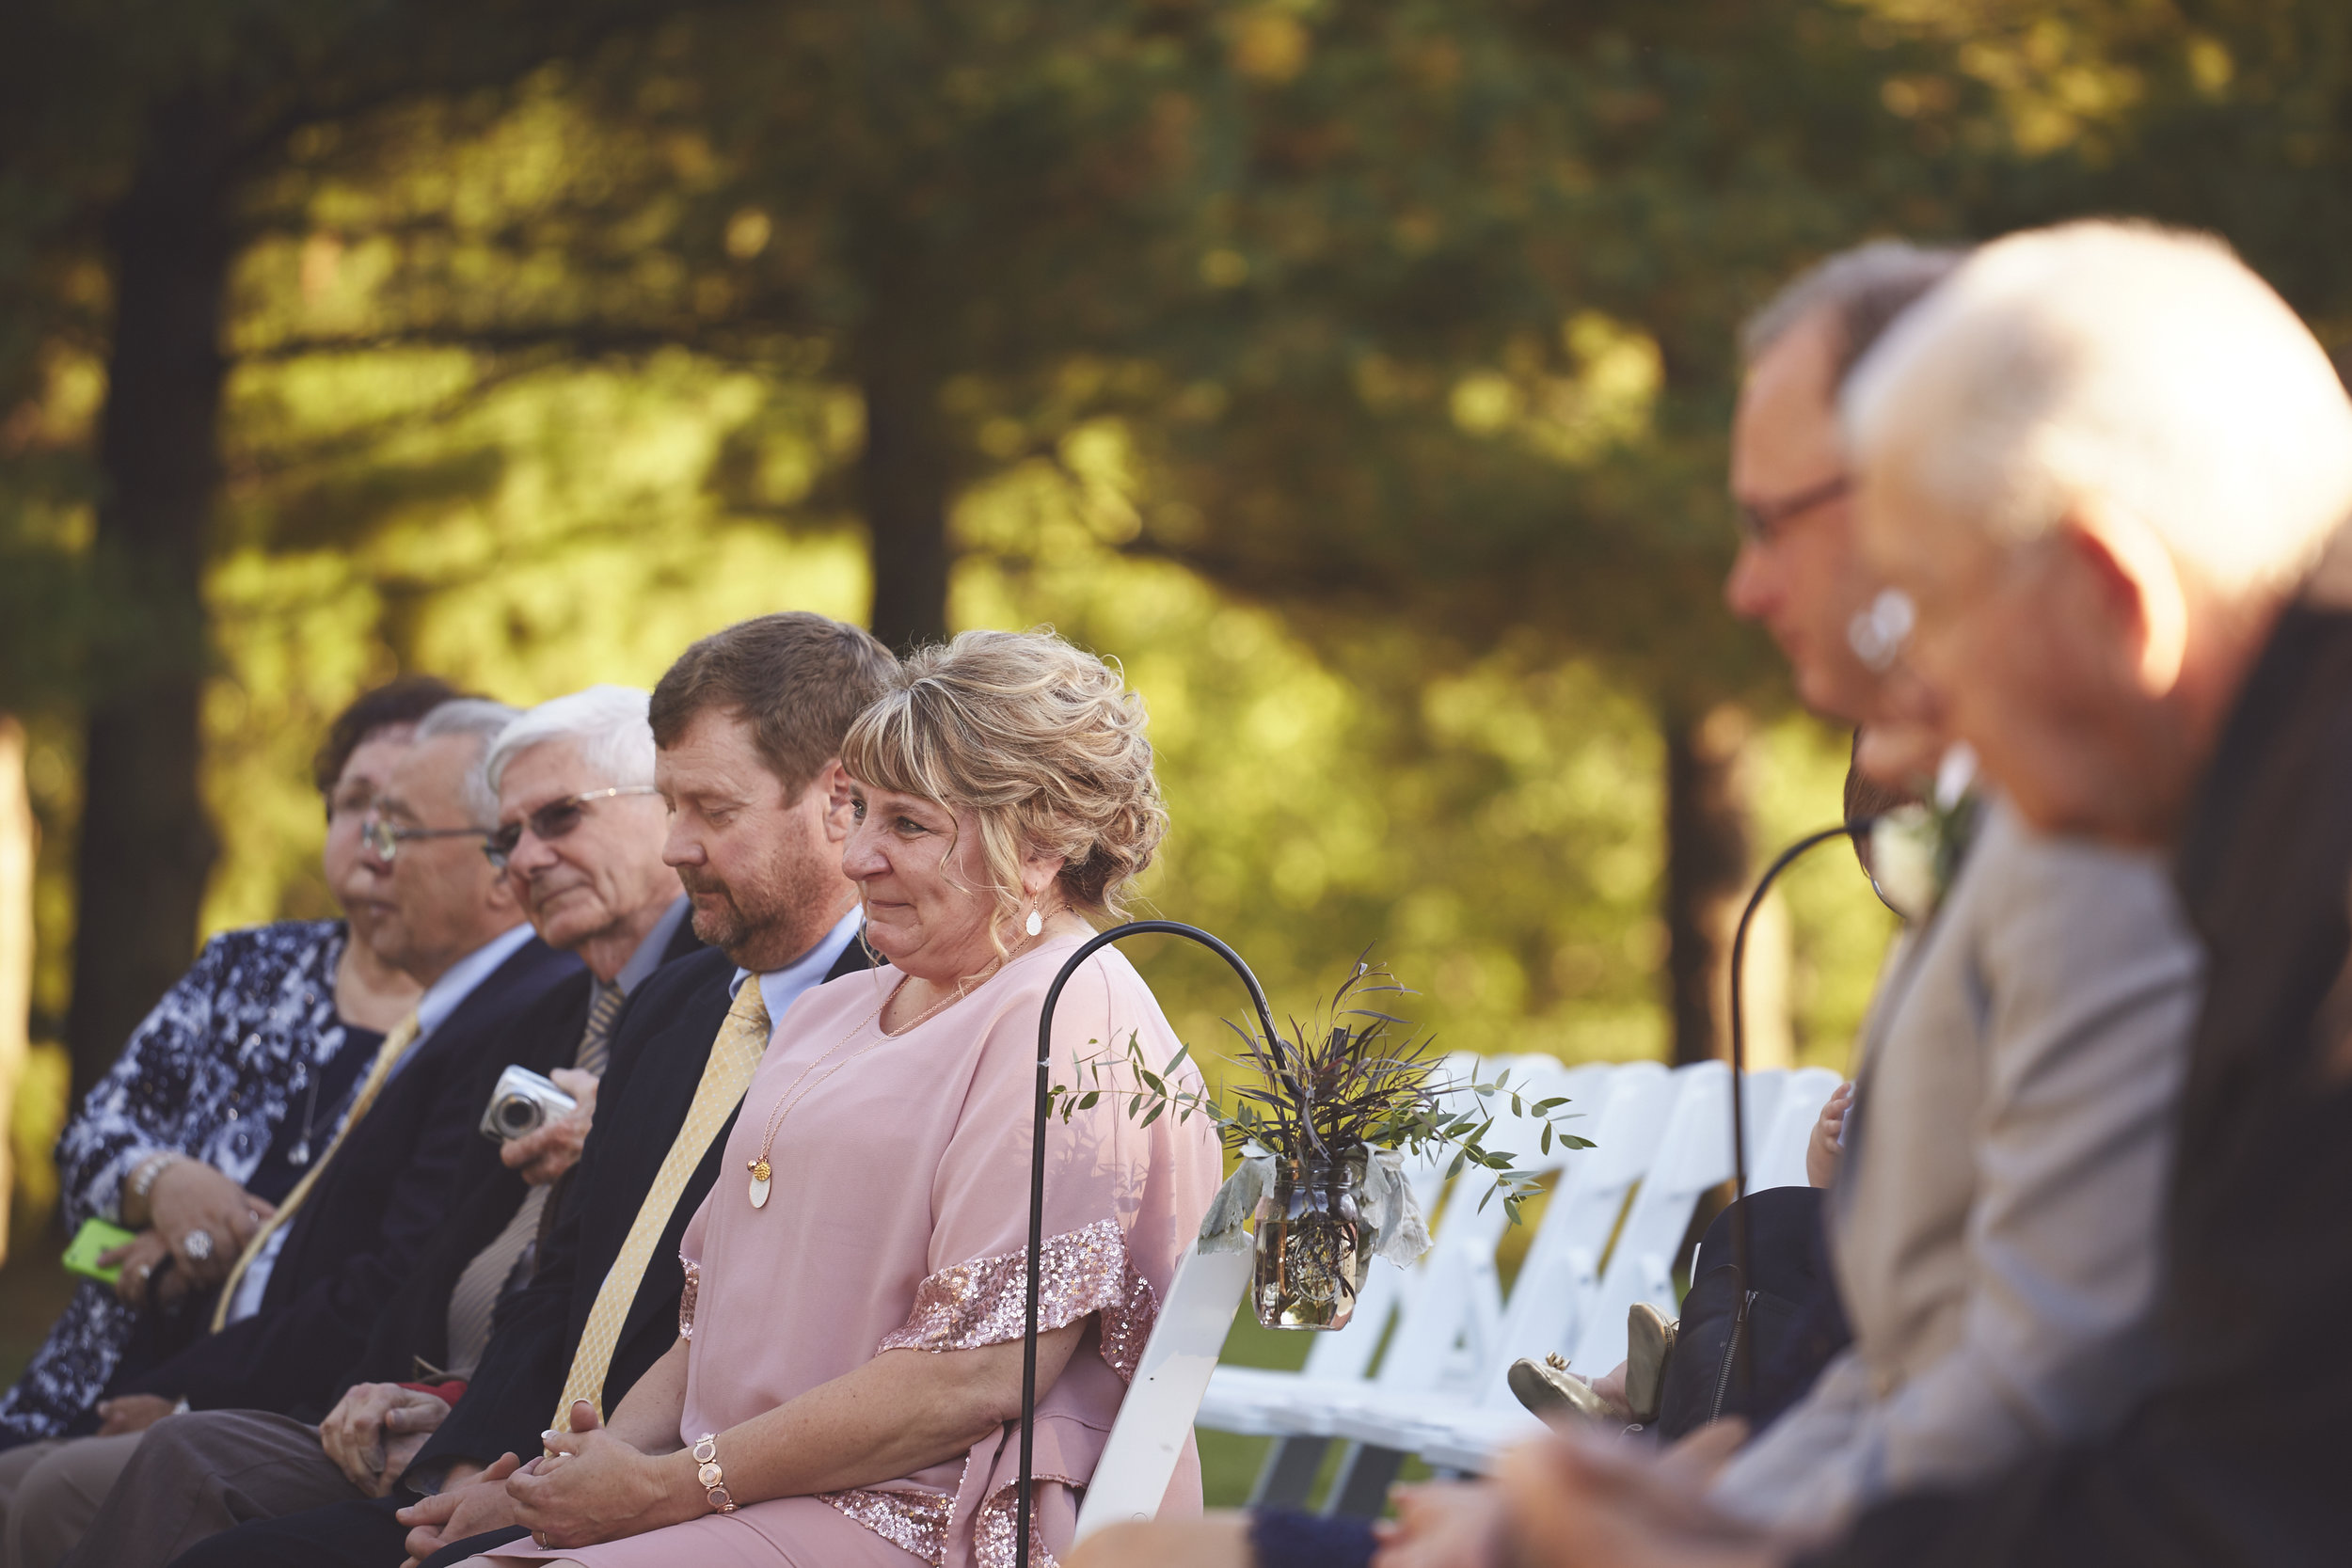 Family at Wedding Ceremony